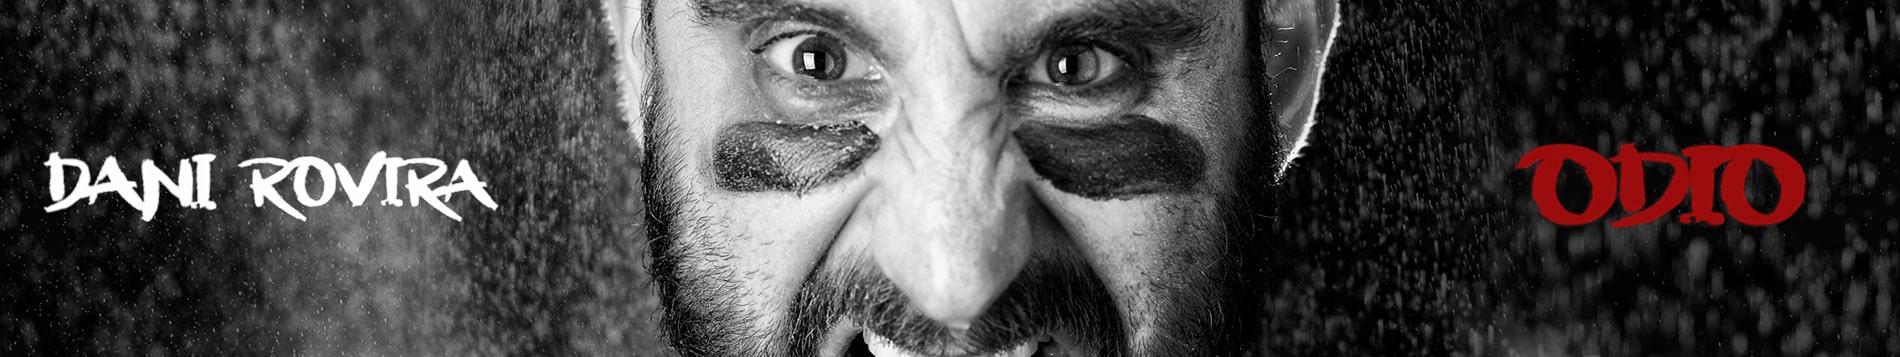 Dani Rovira - Odio (2º asalto)